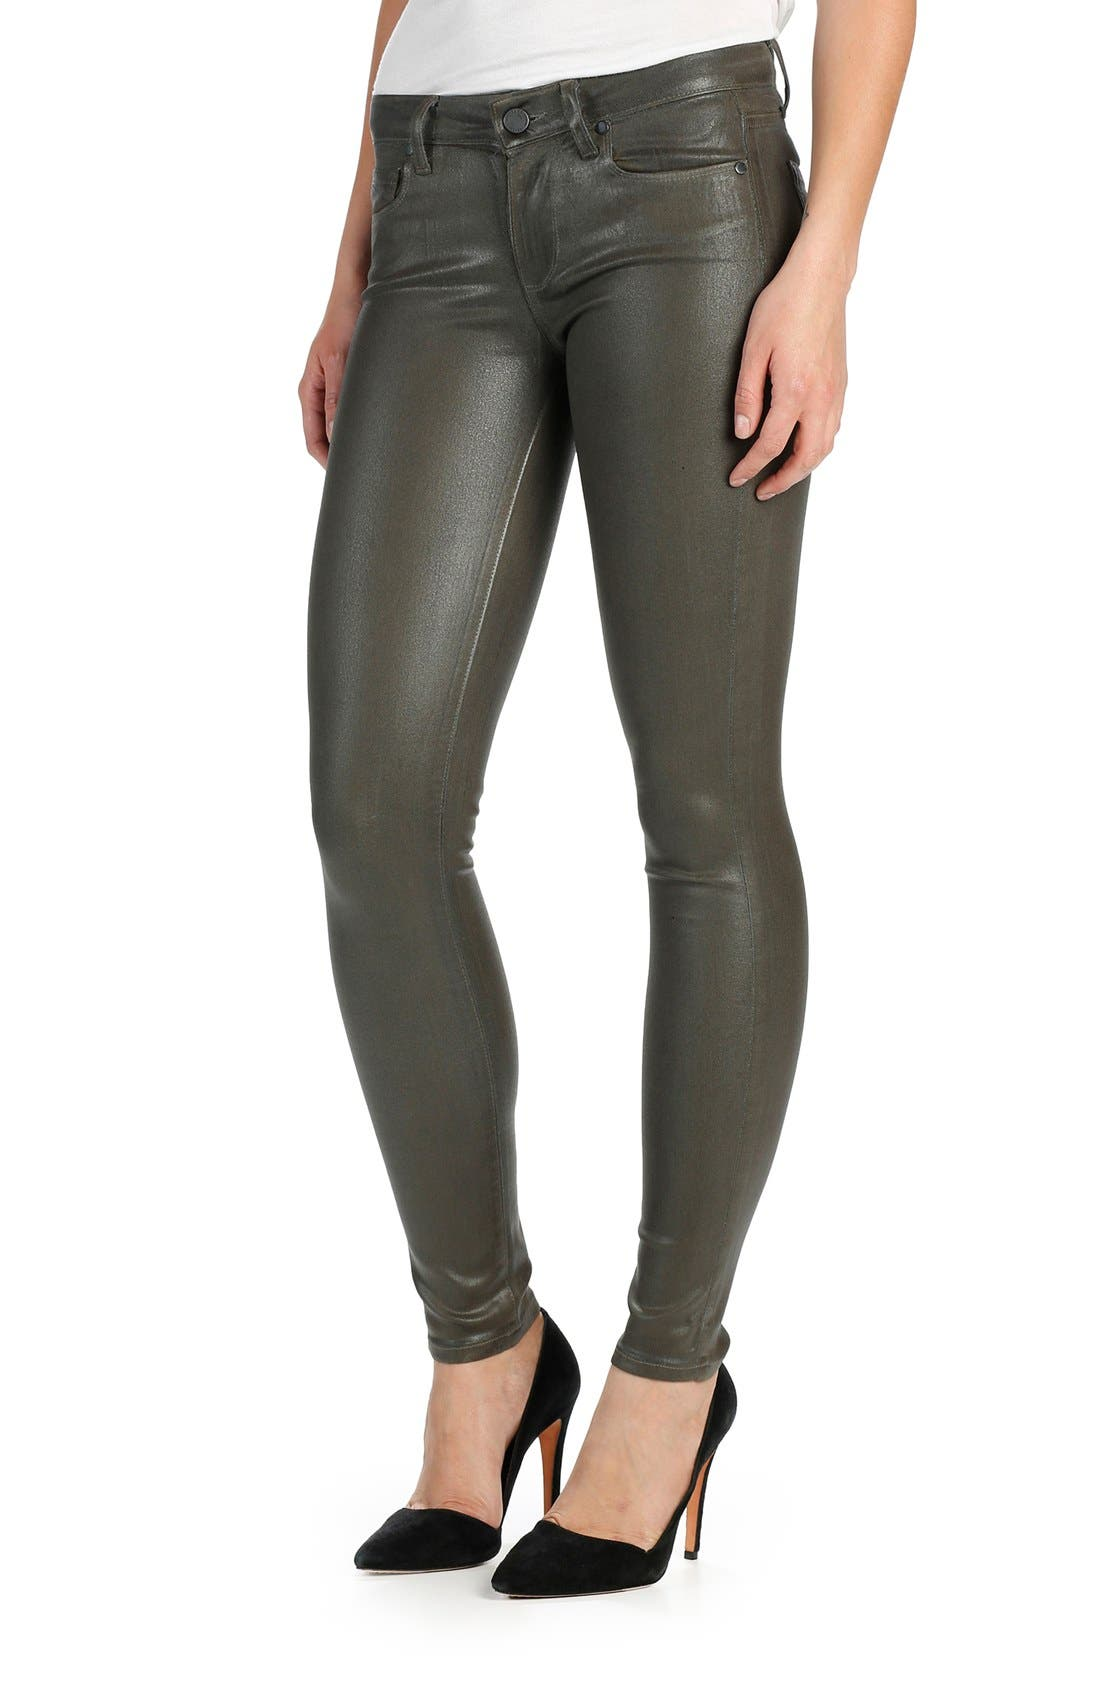 Transcend Verdugo Coated Ultra Skinny Jeans,                             Main thumbnail 1, color,                             300